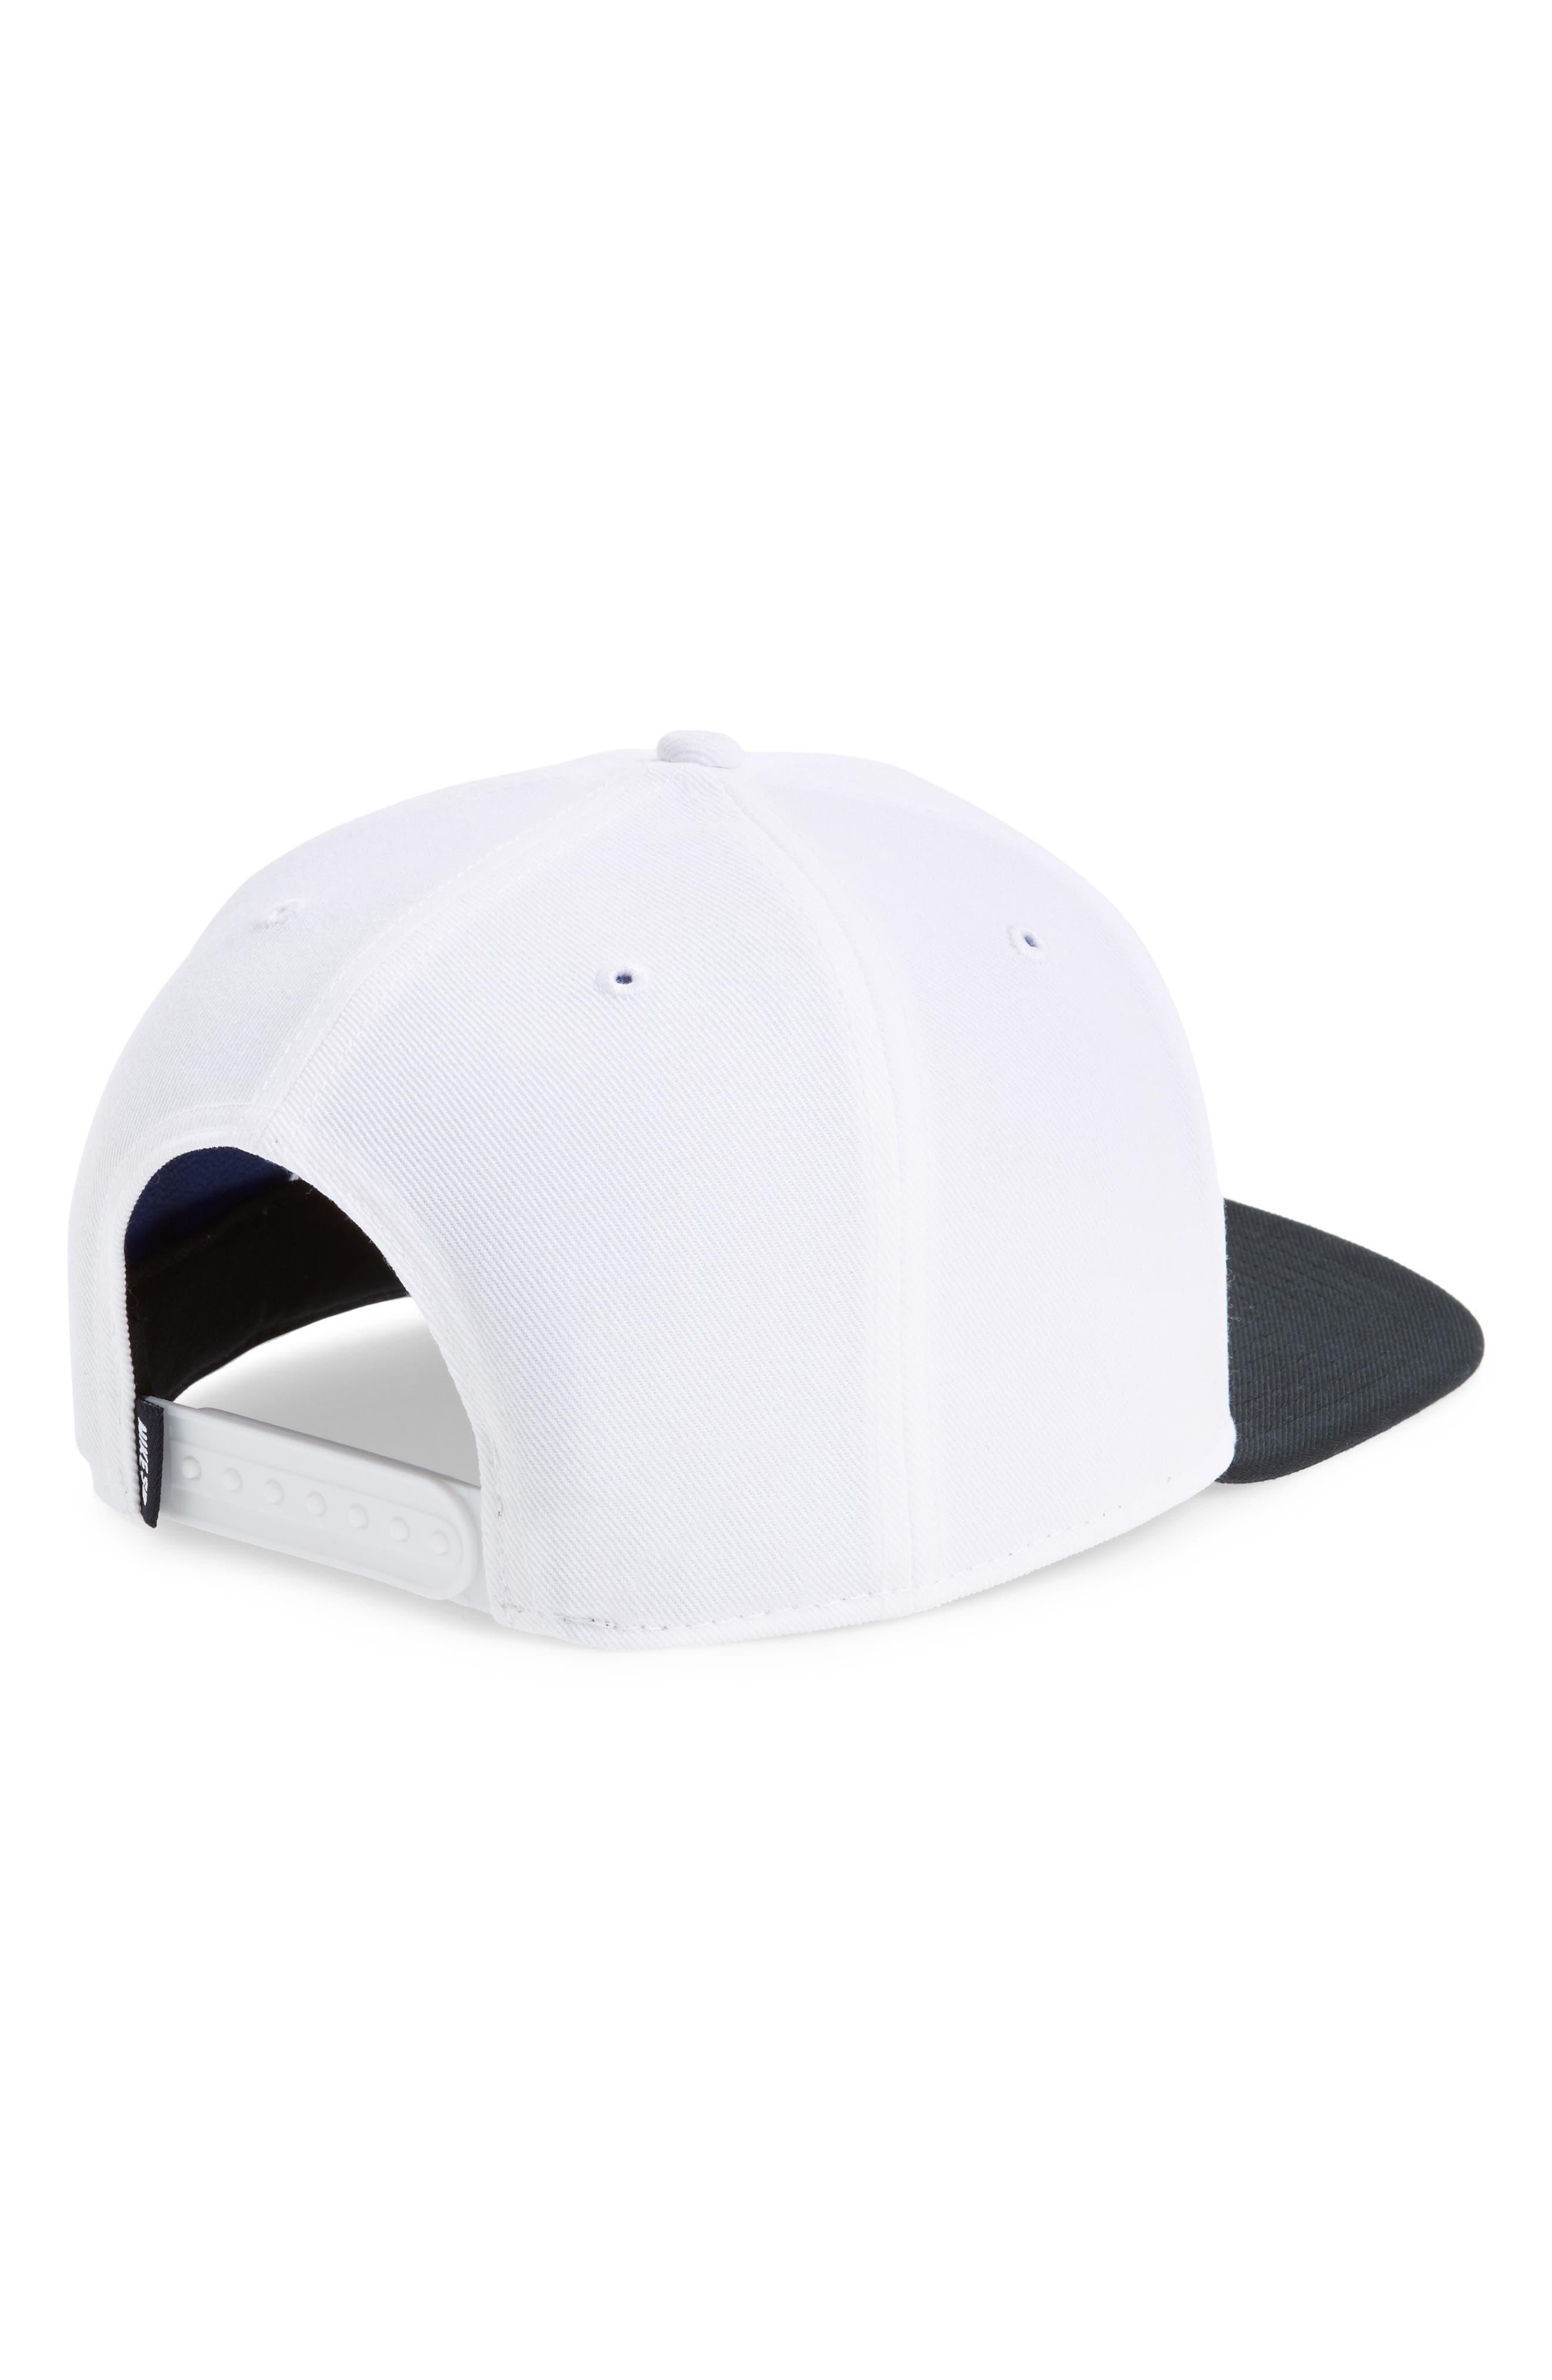 Nike Pro Snapback Baseball Cap,                             Alternate thumbnail 4, color,